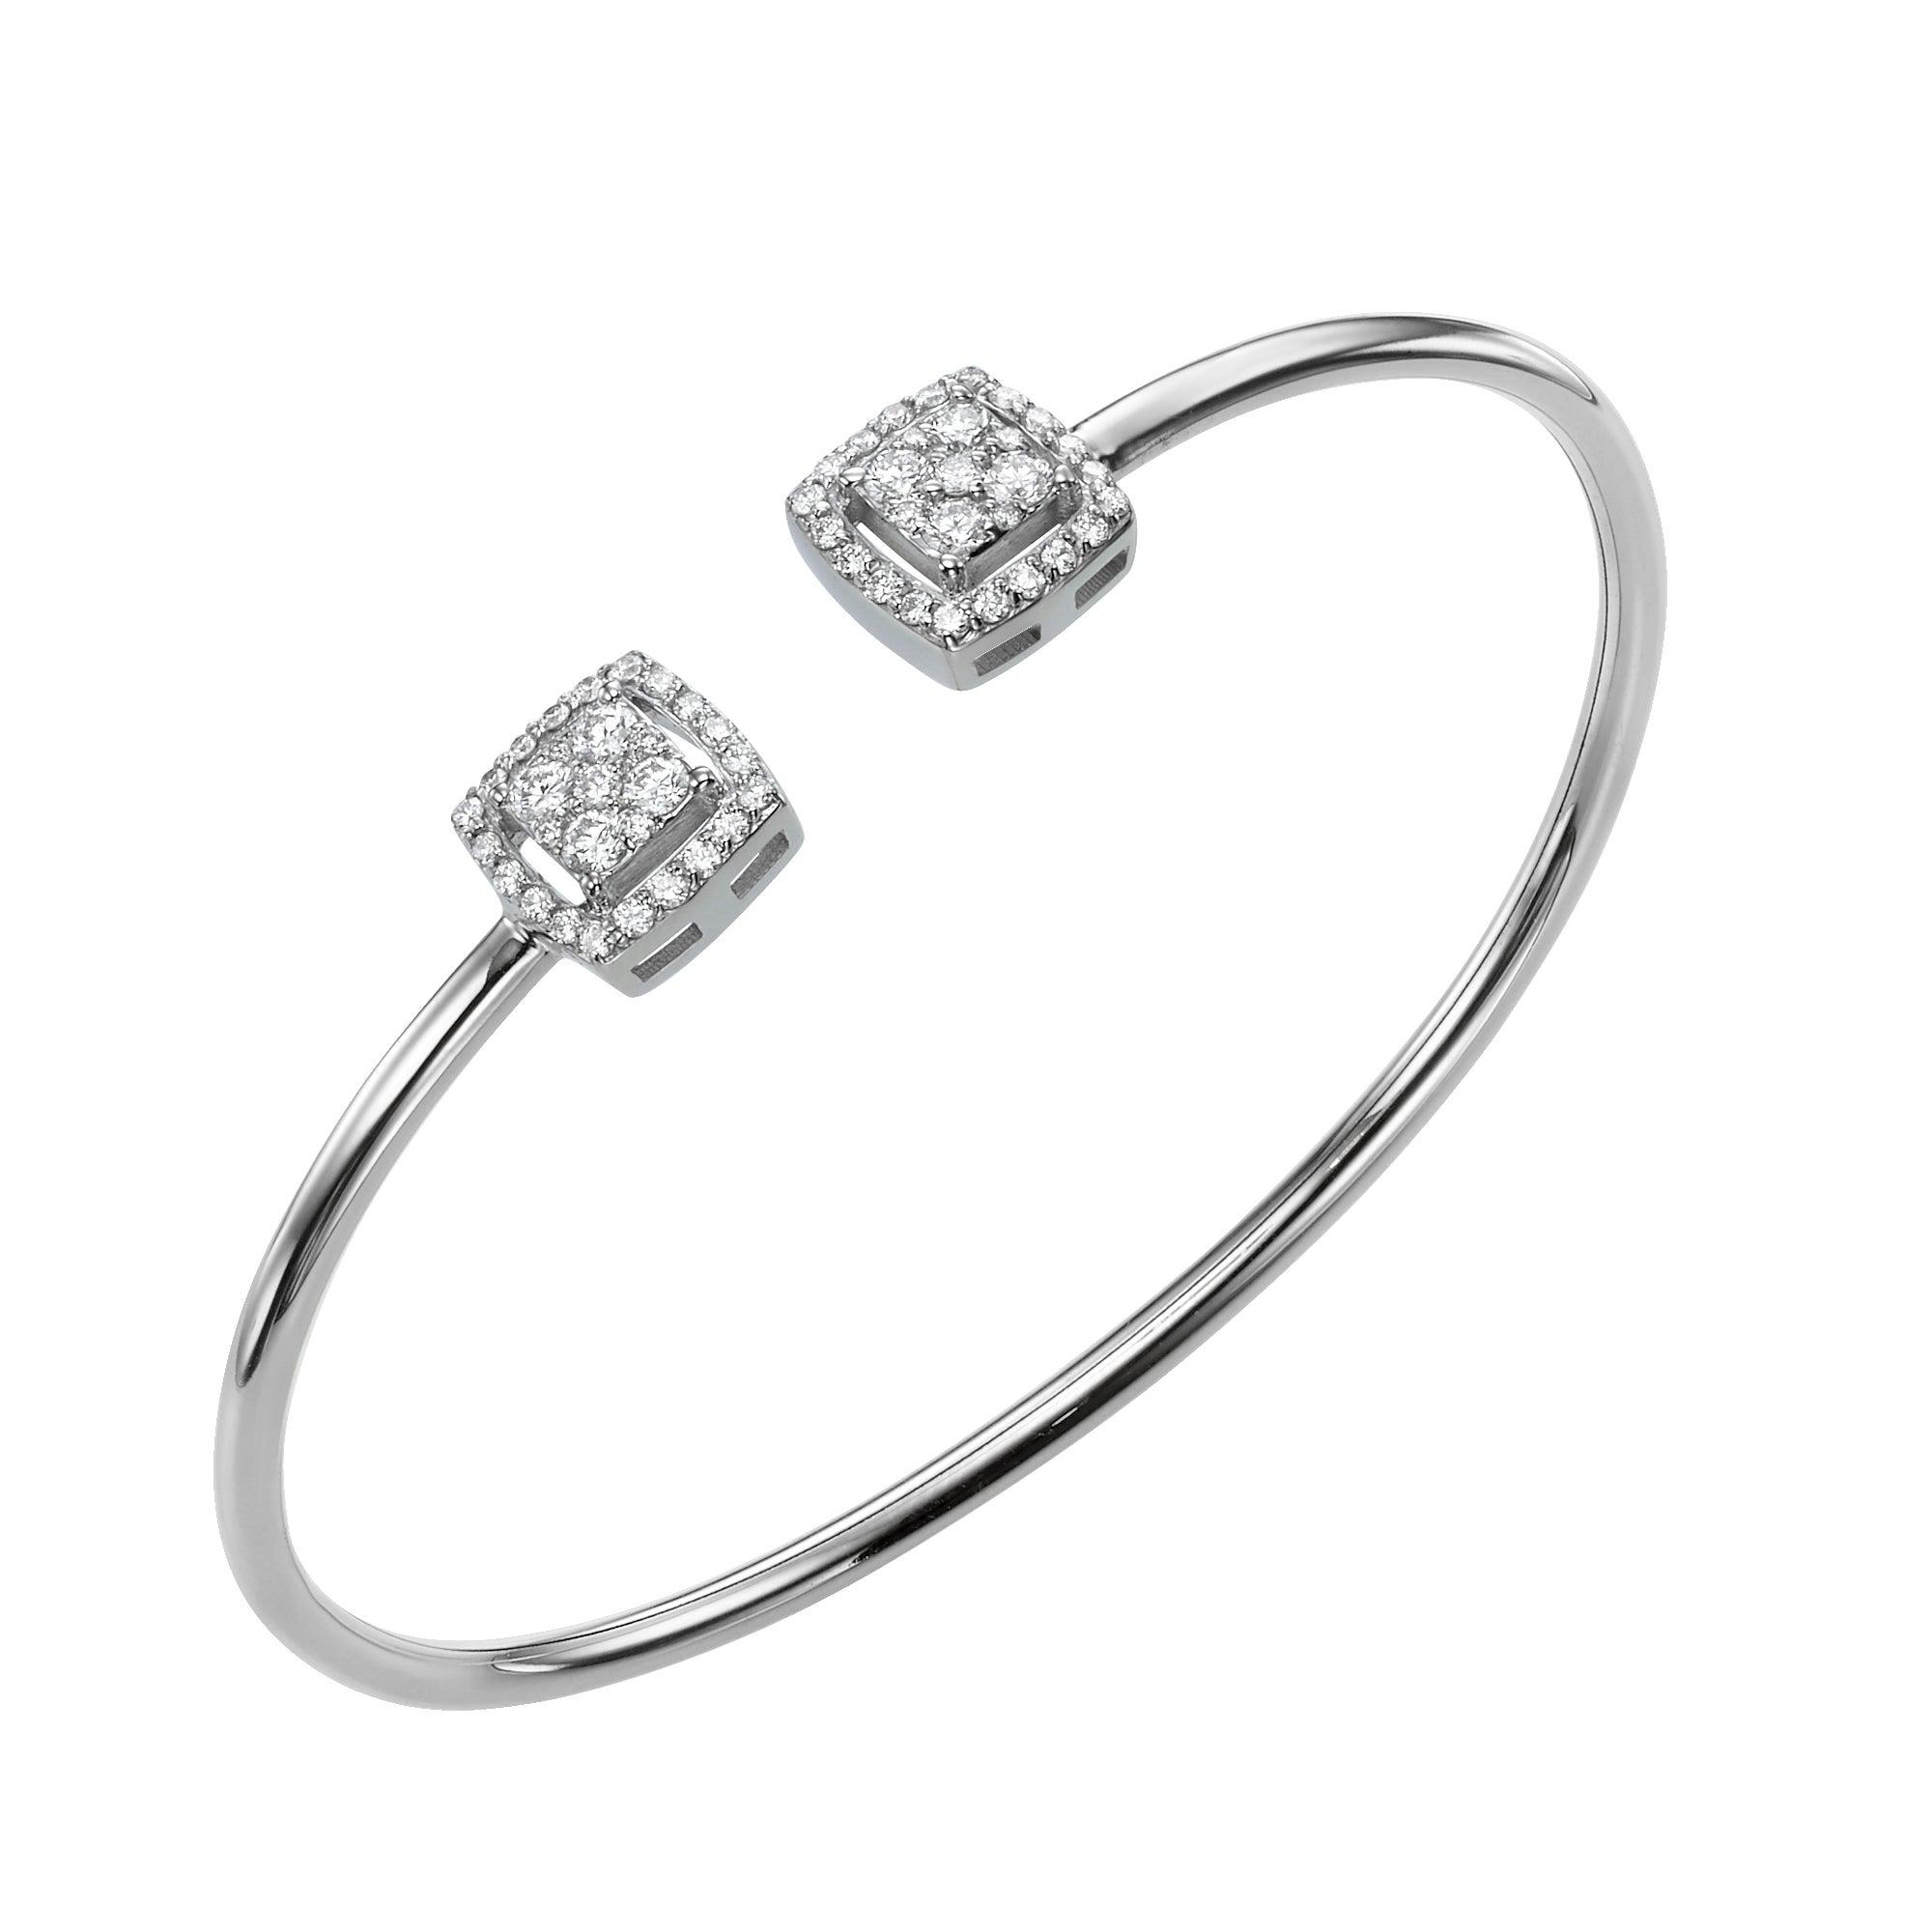 0.68 Carat Diamond Bangle Charm Bracelet 18 Karat Gold Diamond Bangle Bracelet